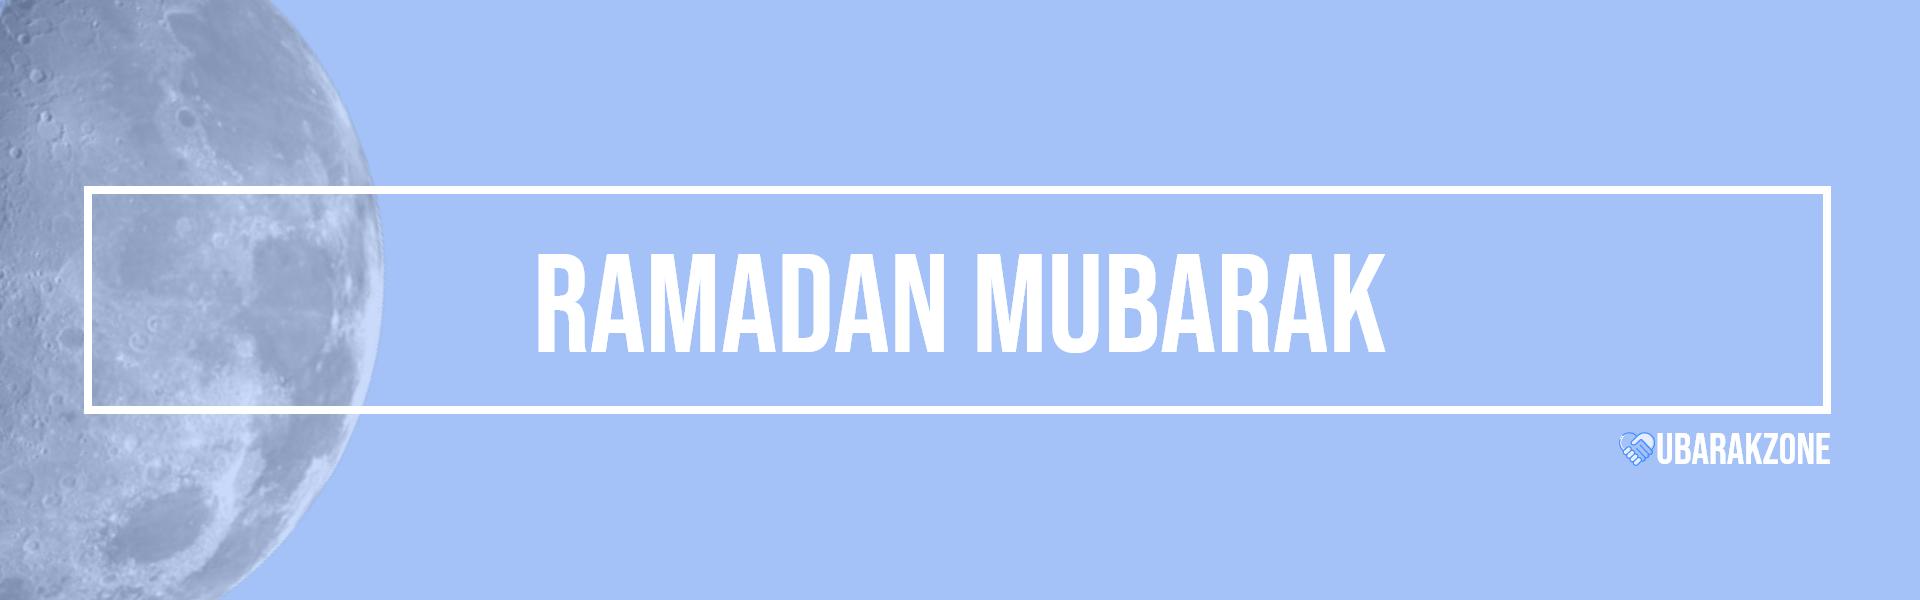 ramadan mubarak wishes messages